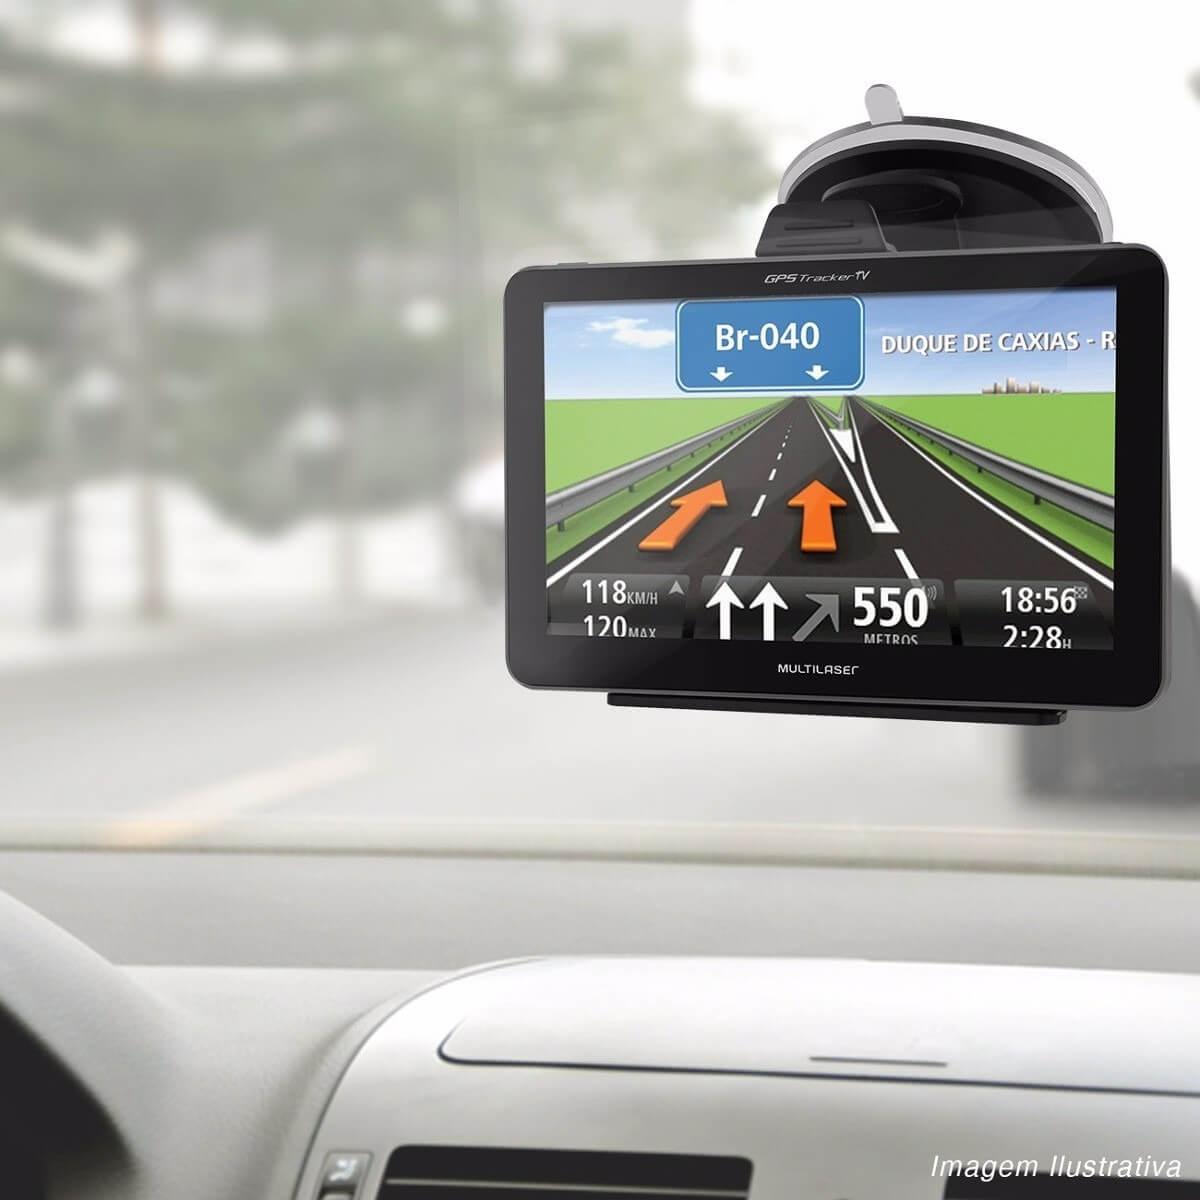 Gps Automotivo Multilaser Tracker GP035 4,3 Tv Alerta Radar